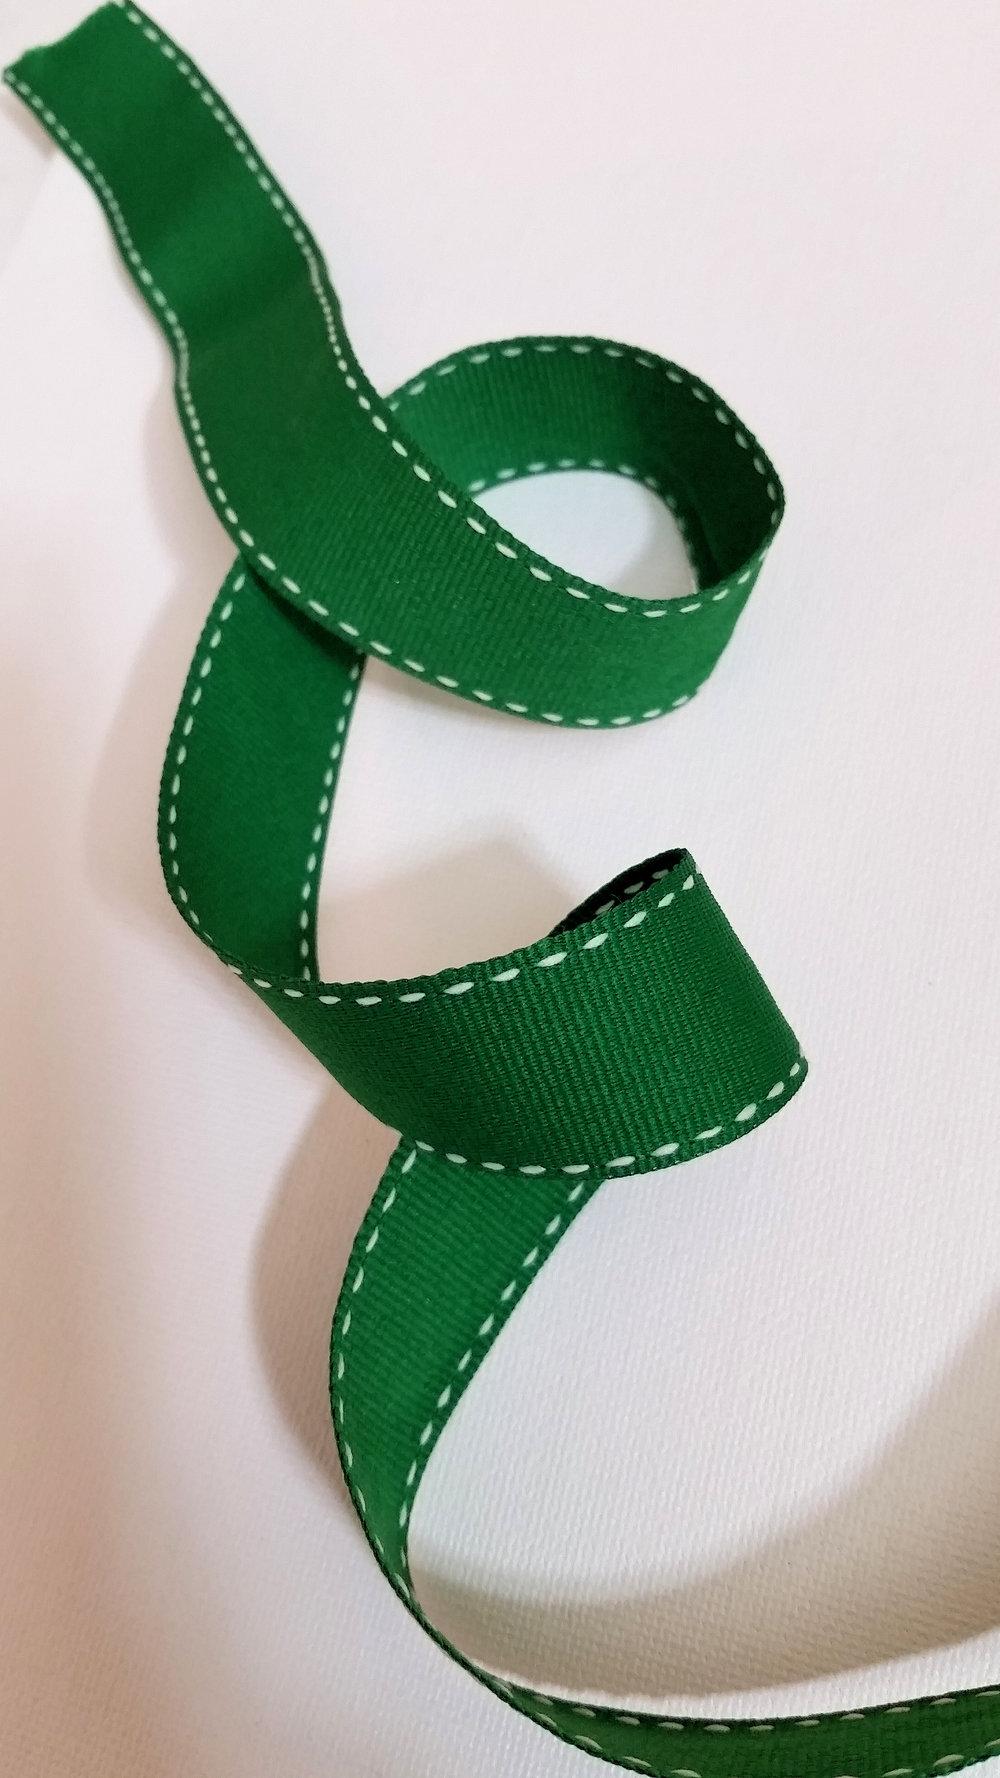 Stitched Edge Green Ribbon.jpg